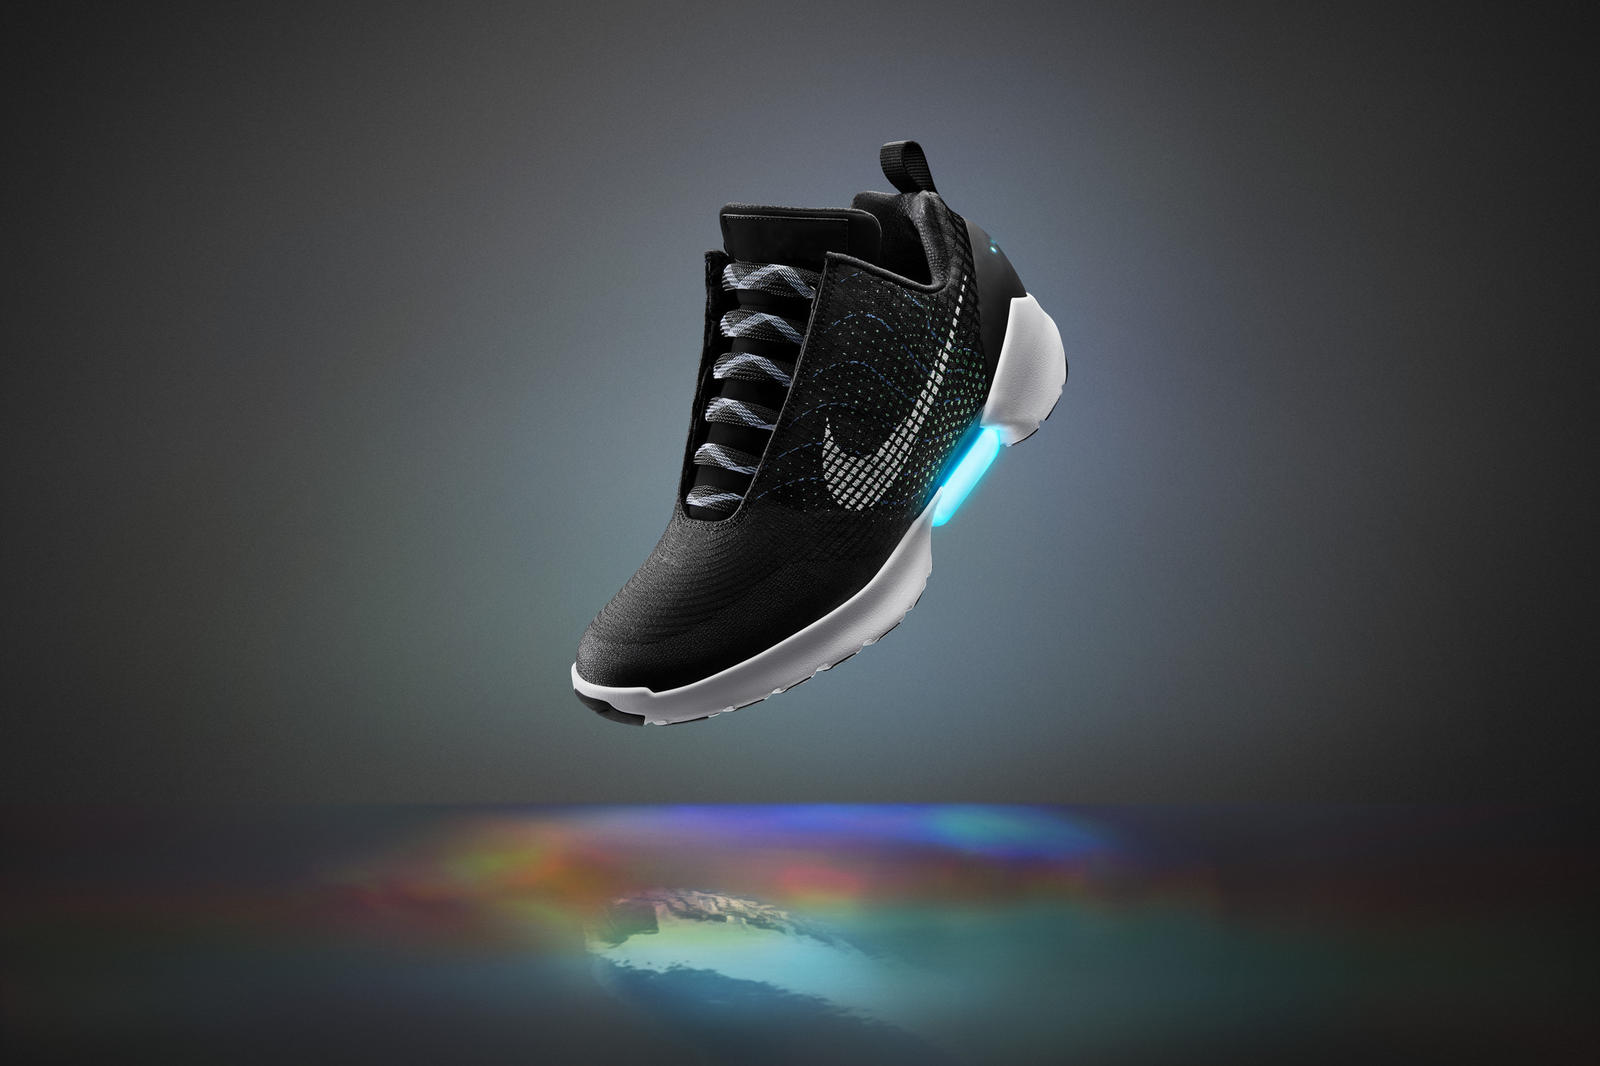 Nike HyperAdapt 1.0 black adaptive lacing 2016